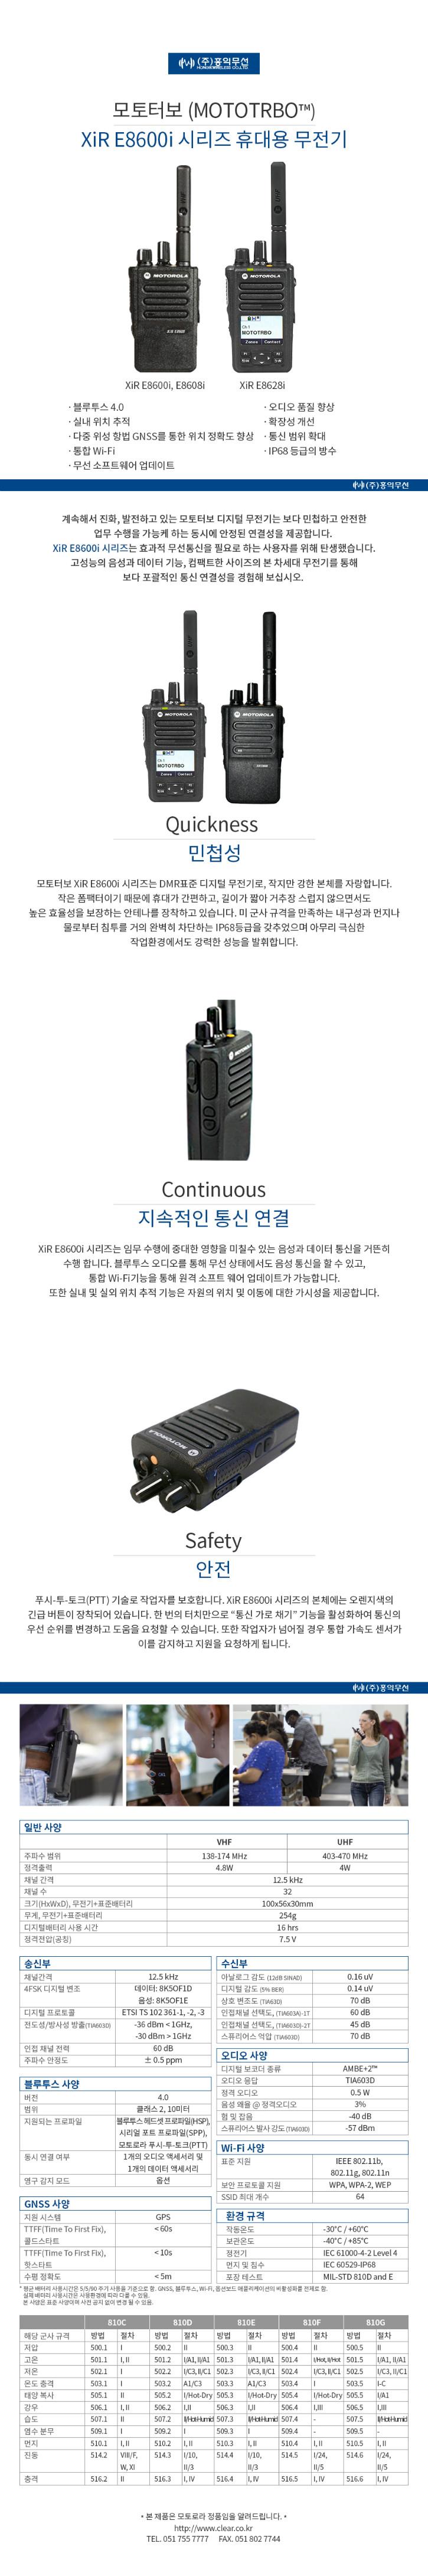 XiR-E8600i-ser_랜딩_아날로그삭제.jpg